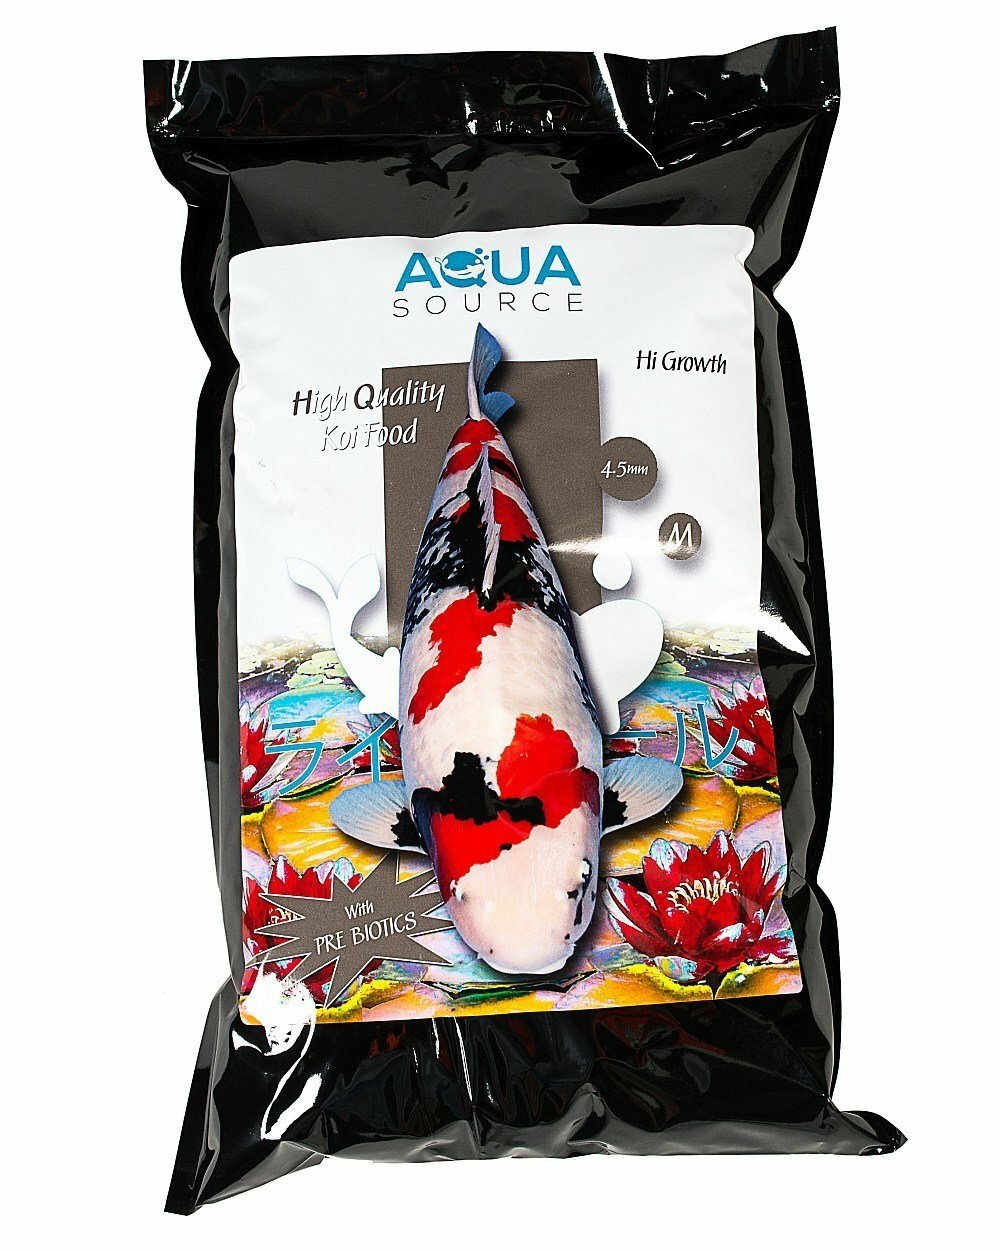 Aqua Source All Season with Bee Propolis Koi Food 10 Kg